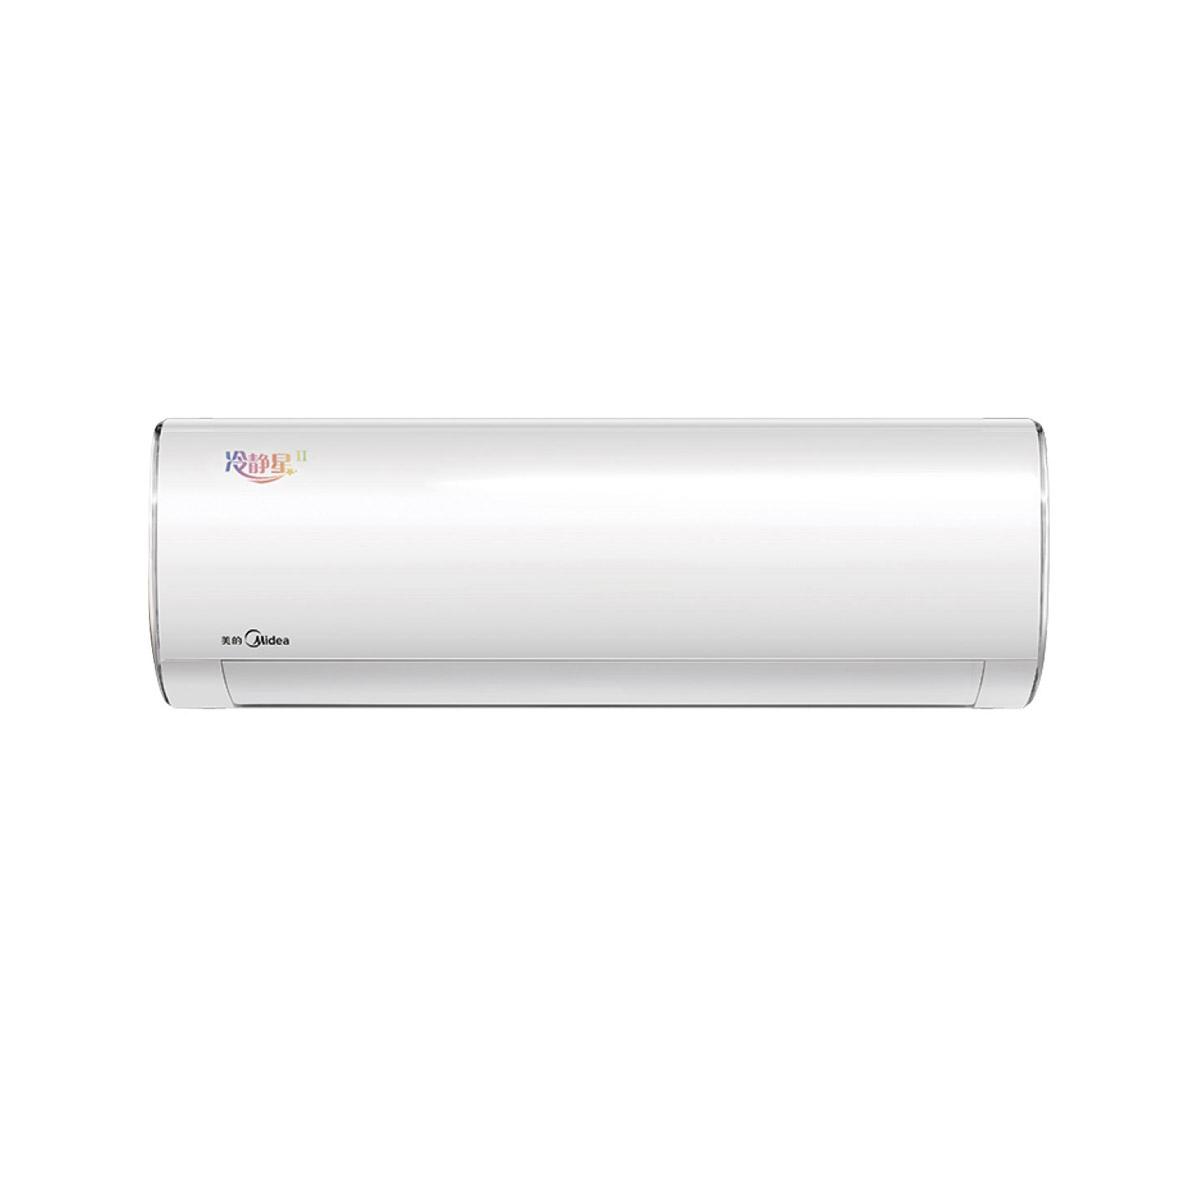 Midea/美的 KFR-26GW/BP3DN8Y-PC401(1)家用空调套机 说明书.pdf